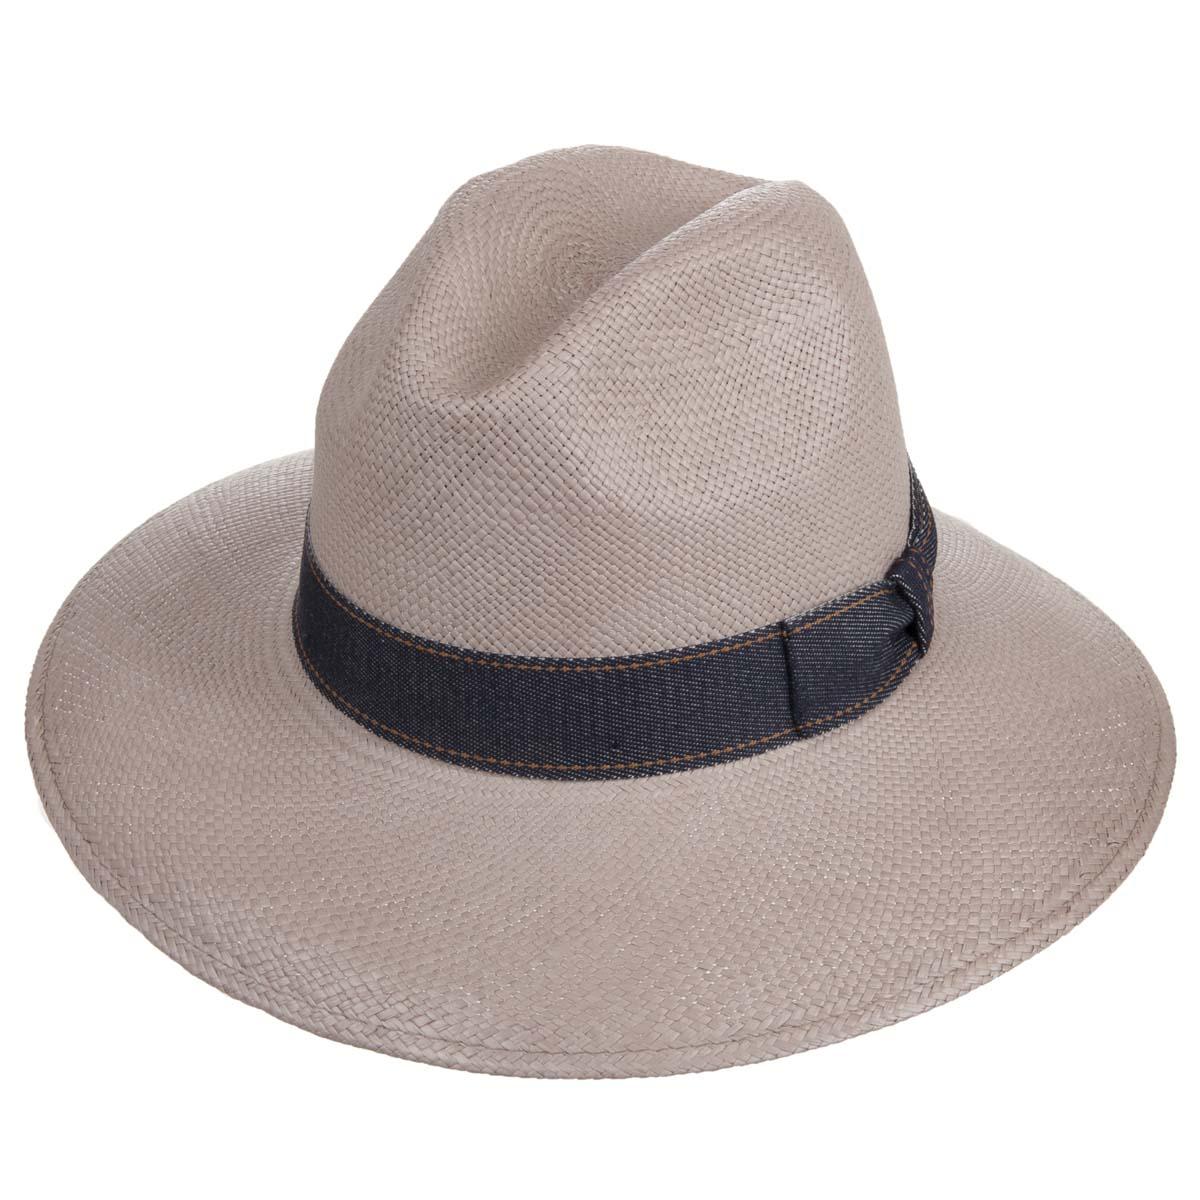 Hat wide-brimmed - stylish, fashionable, original